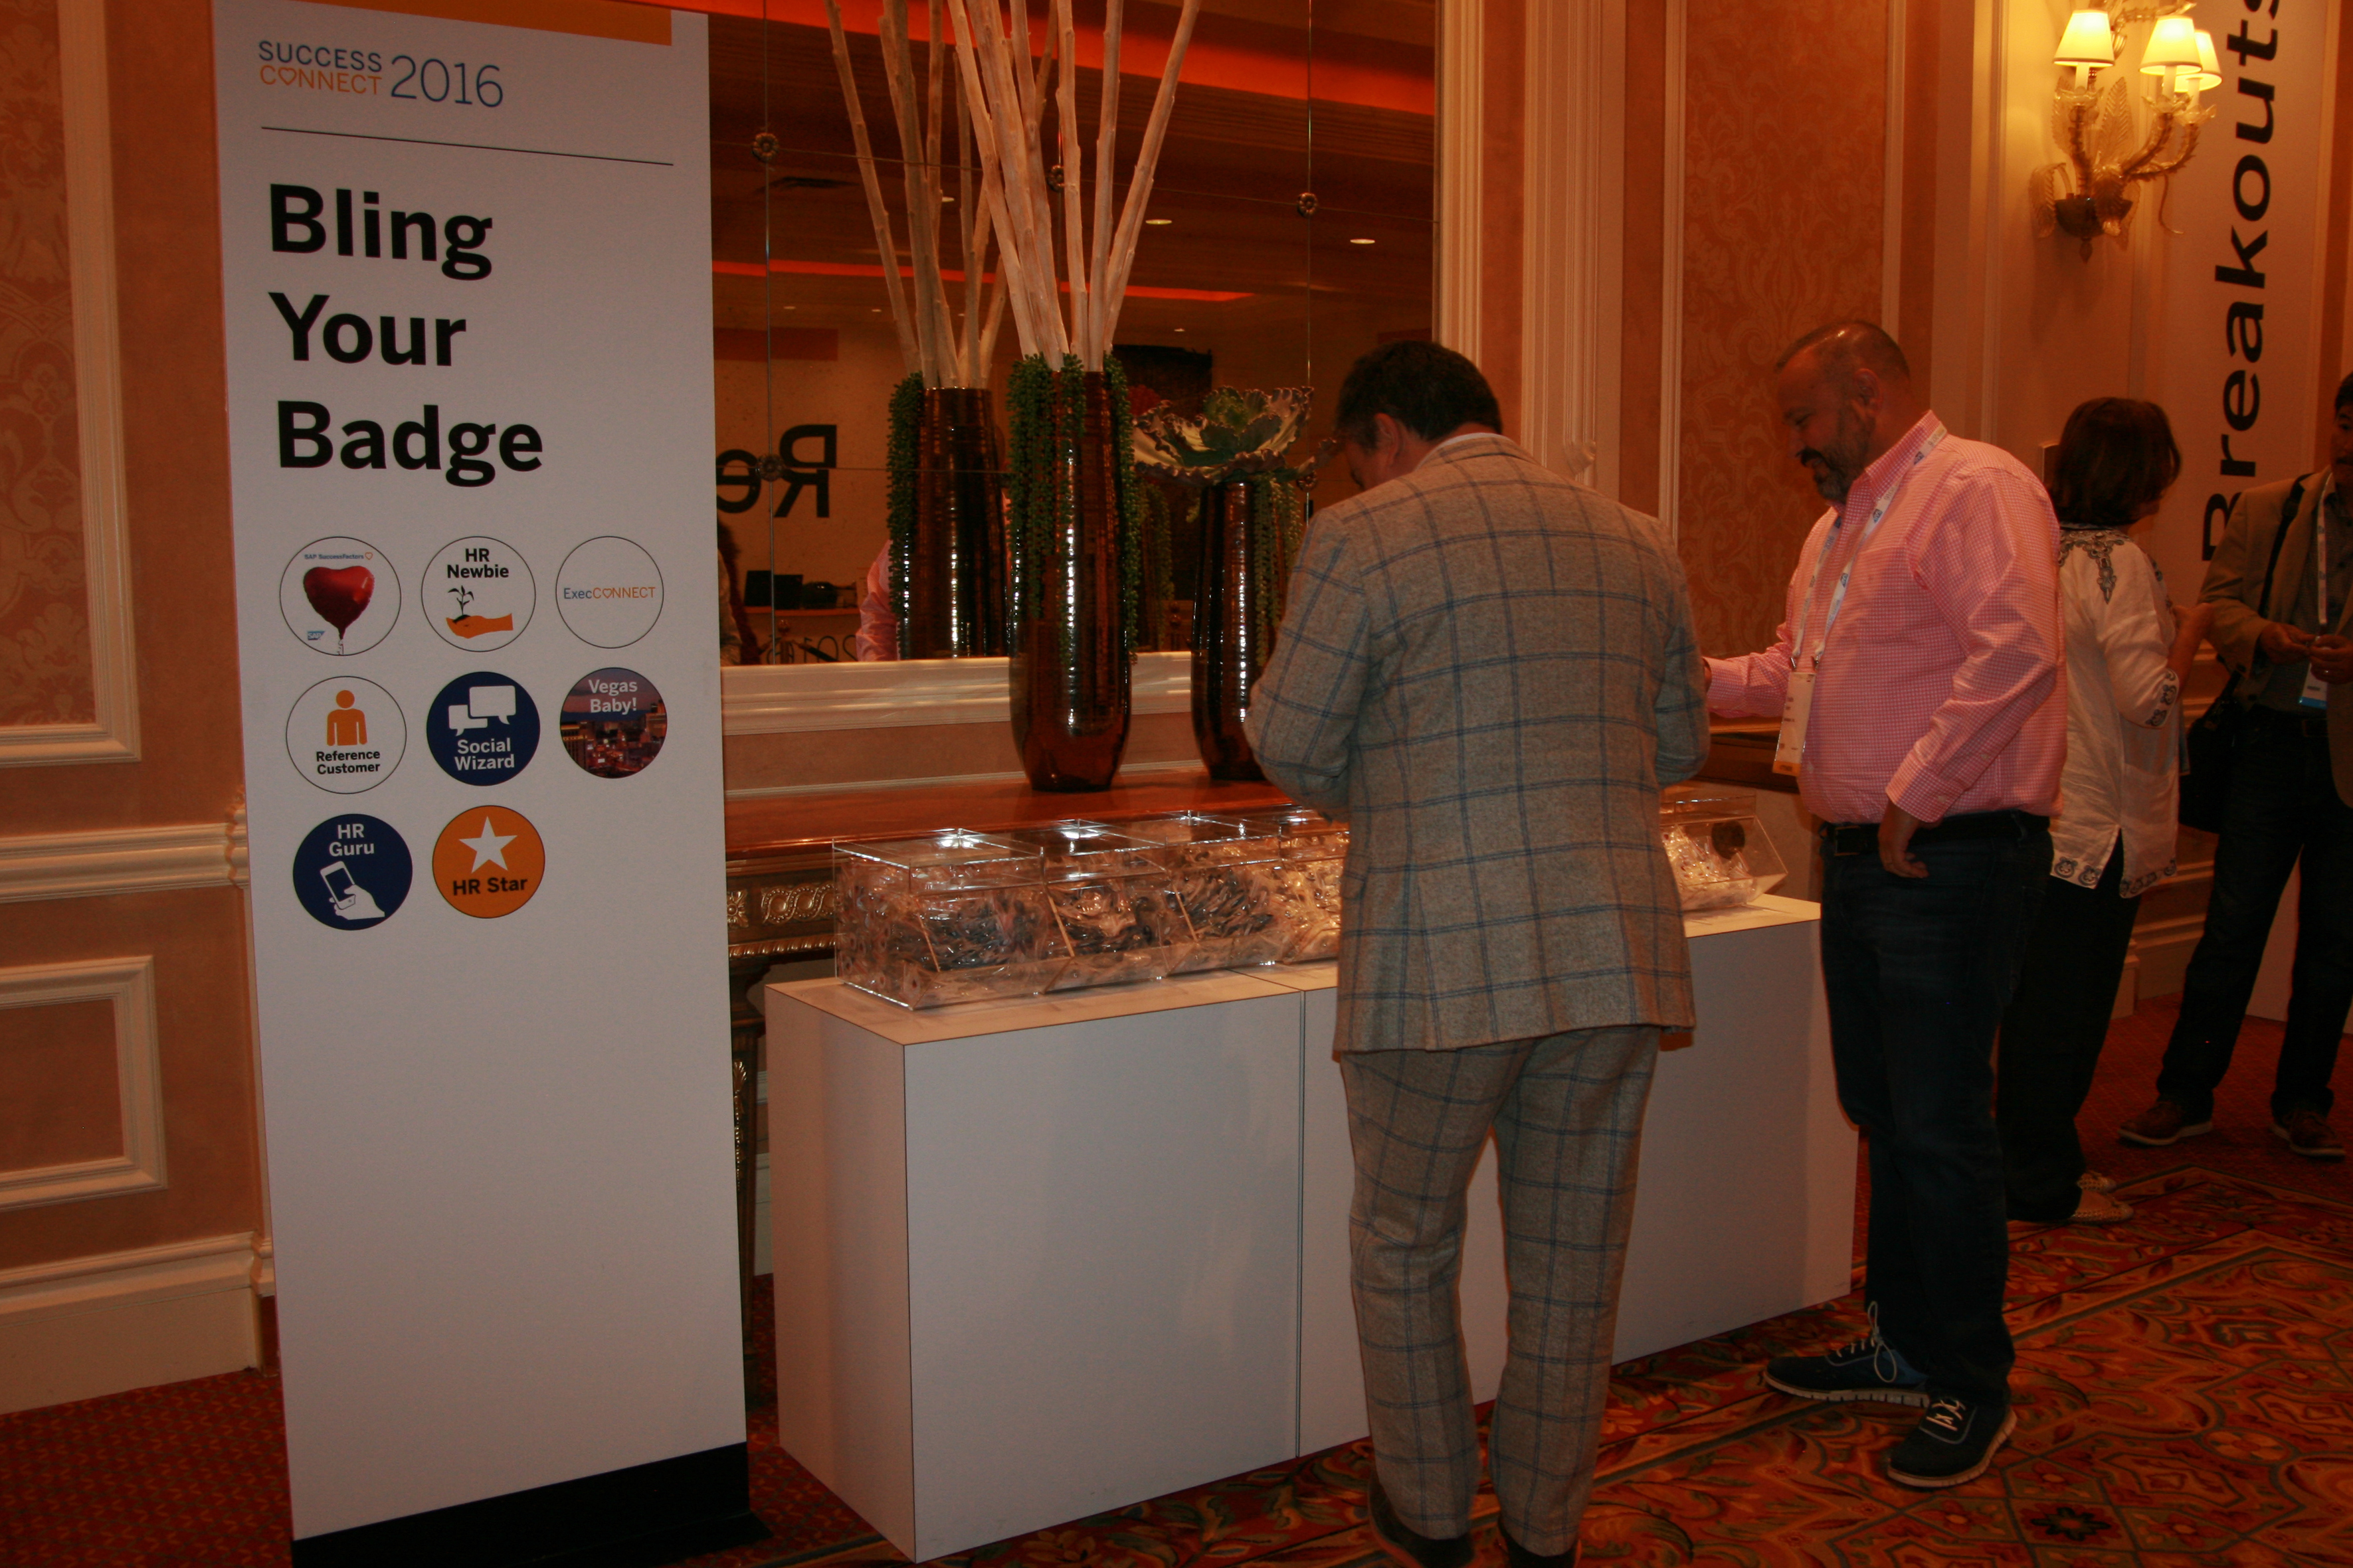 SAP Slideshow 2 - Bling your badge